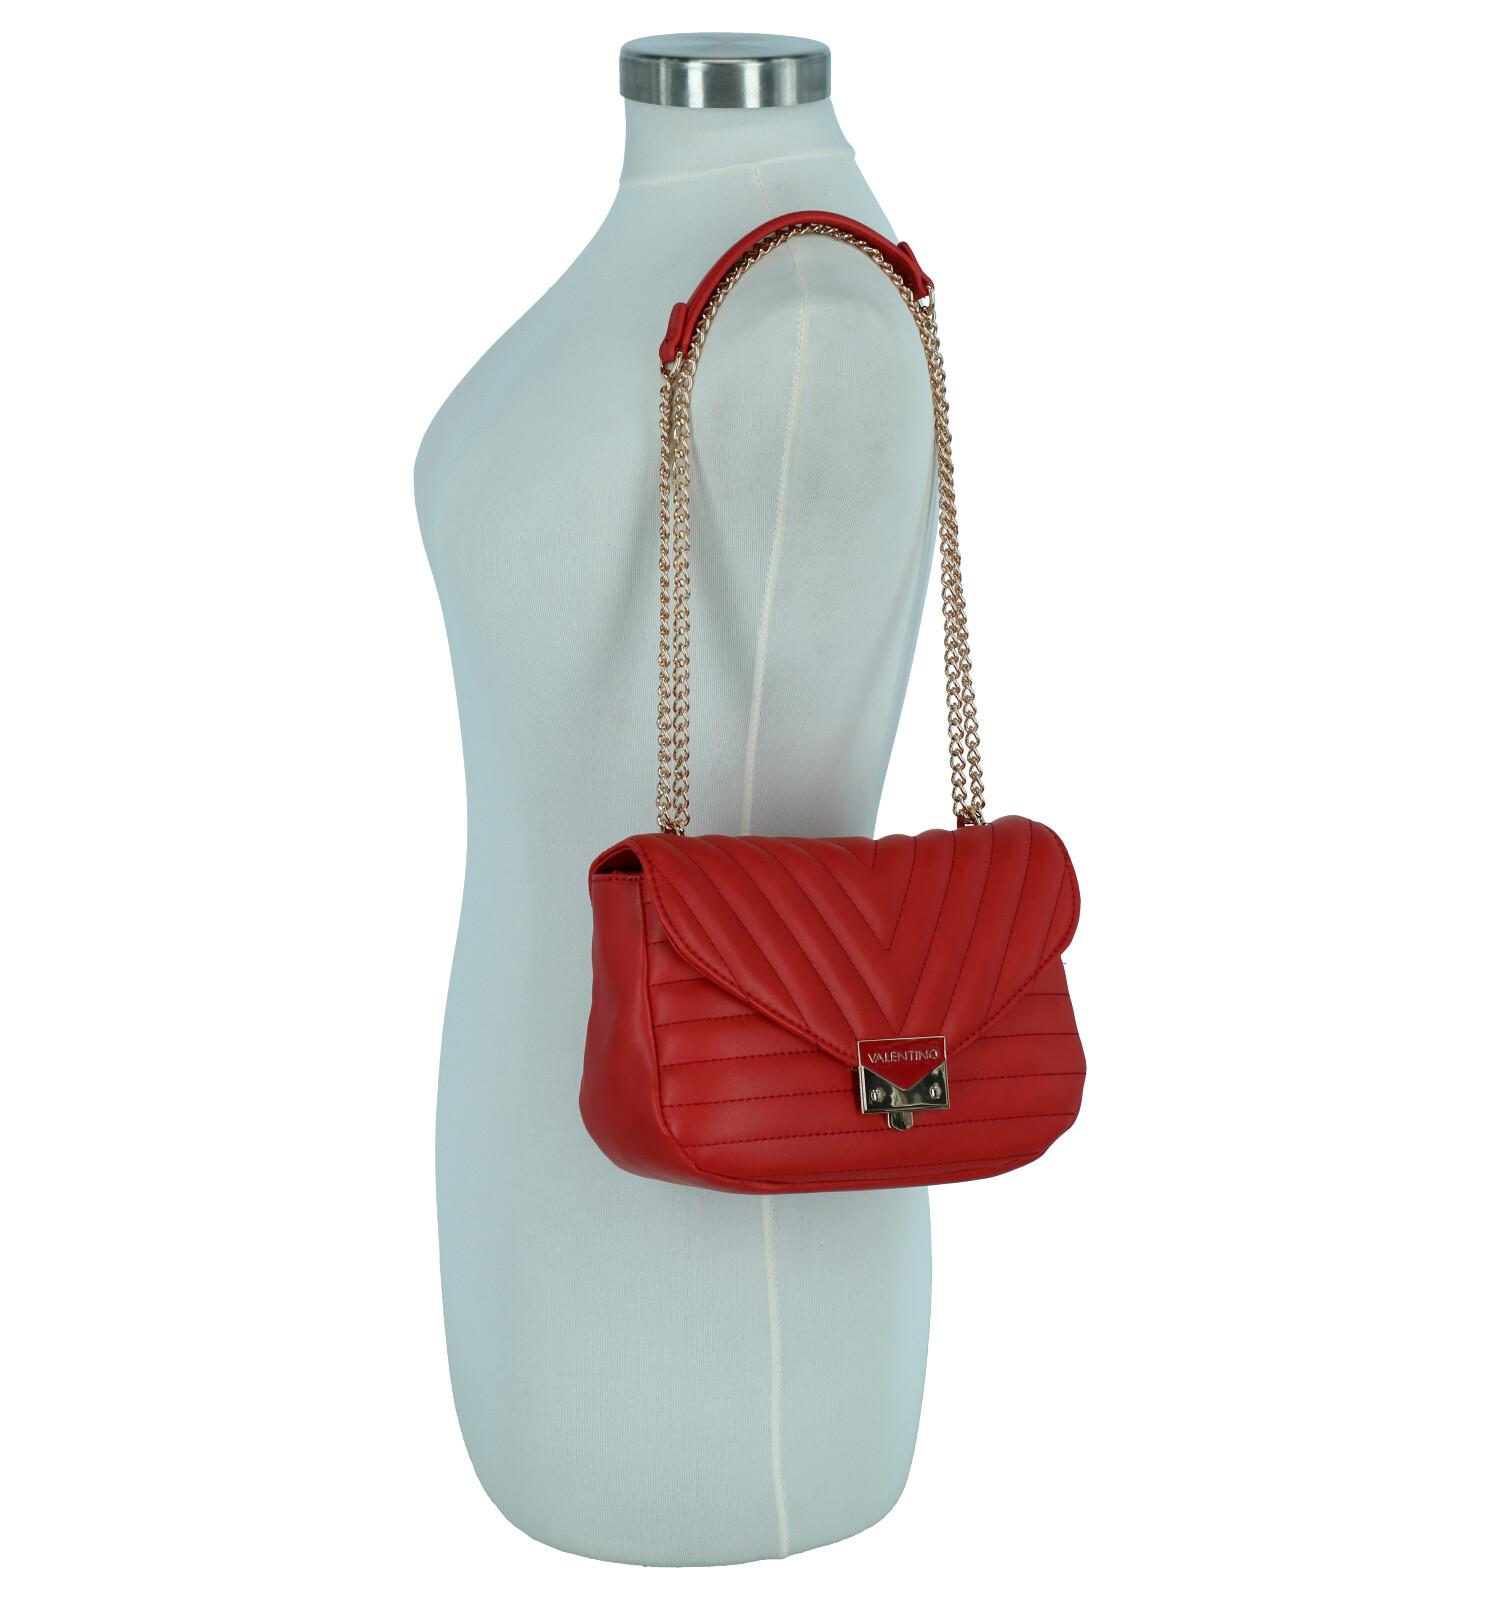 Handbags Cajon Rode Tas Valentino Crossbody jLzpVqSUMG